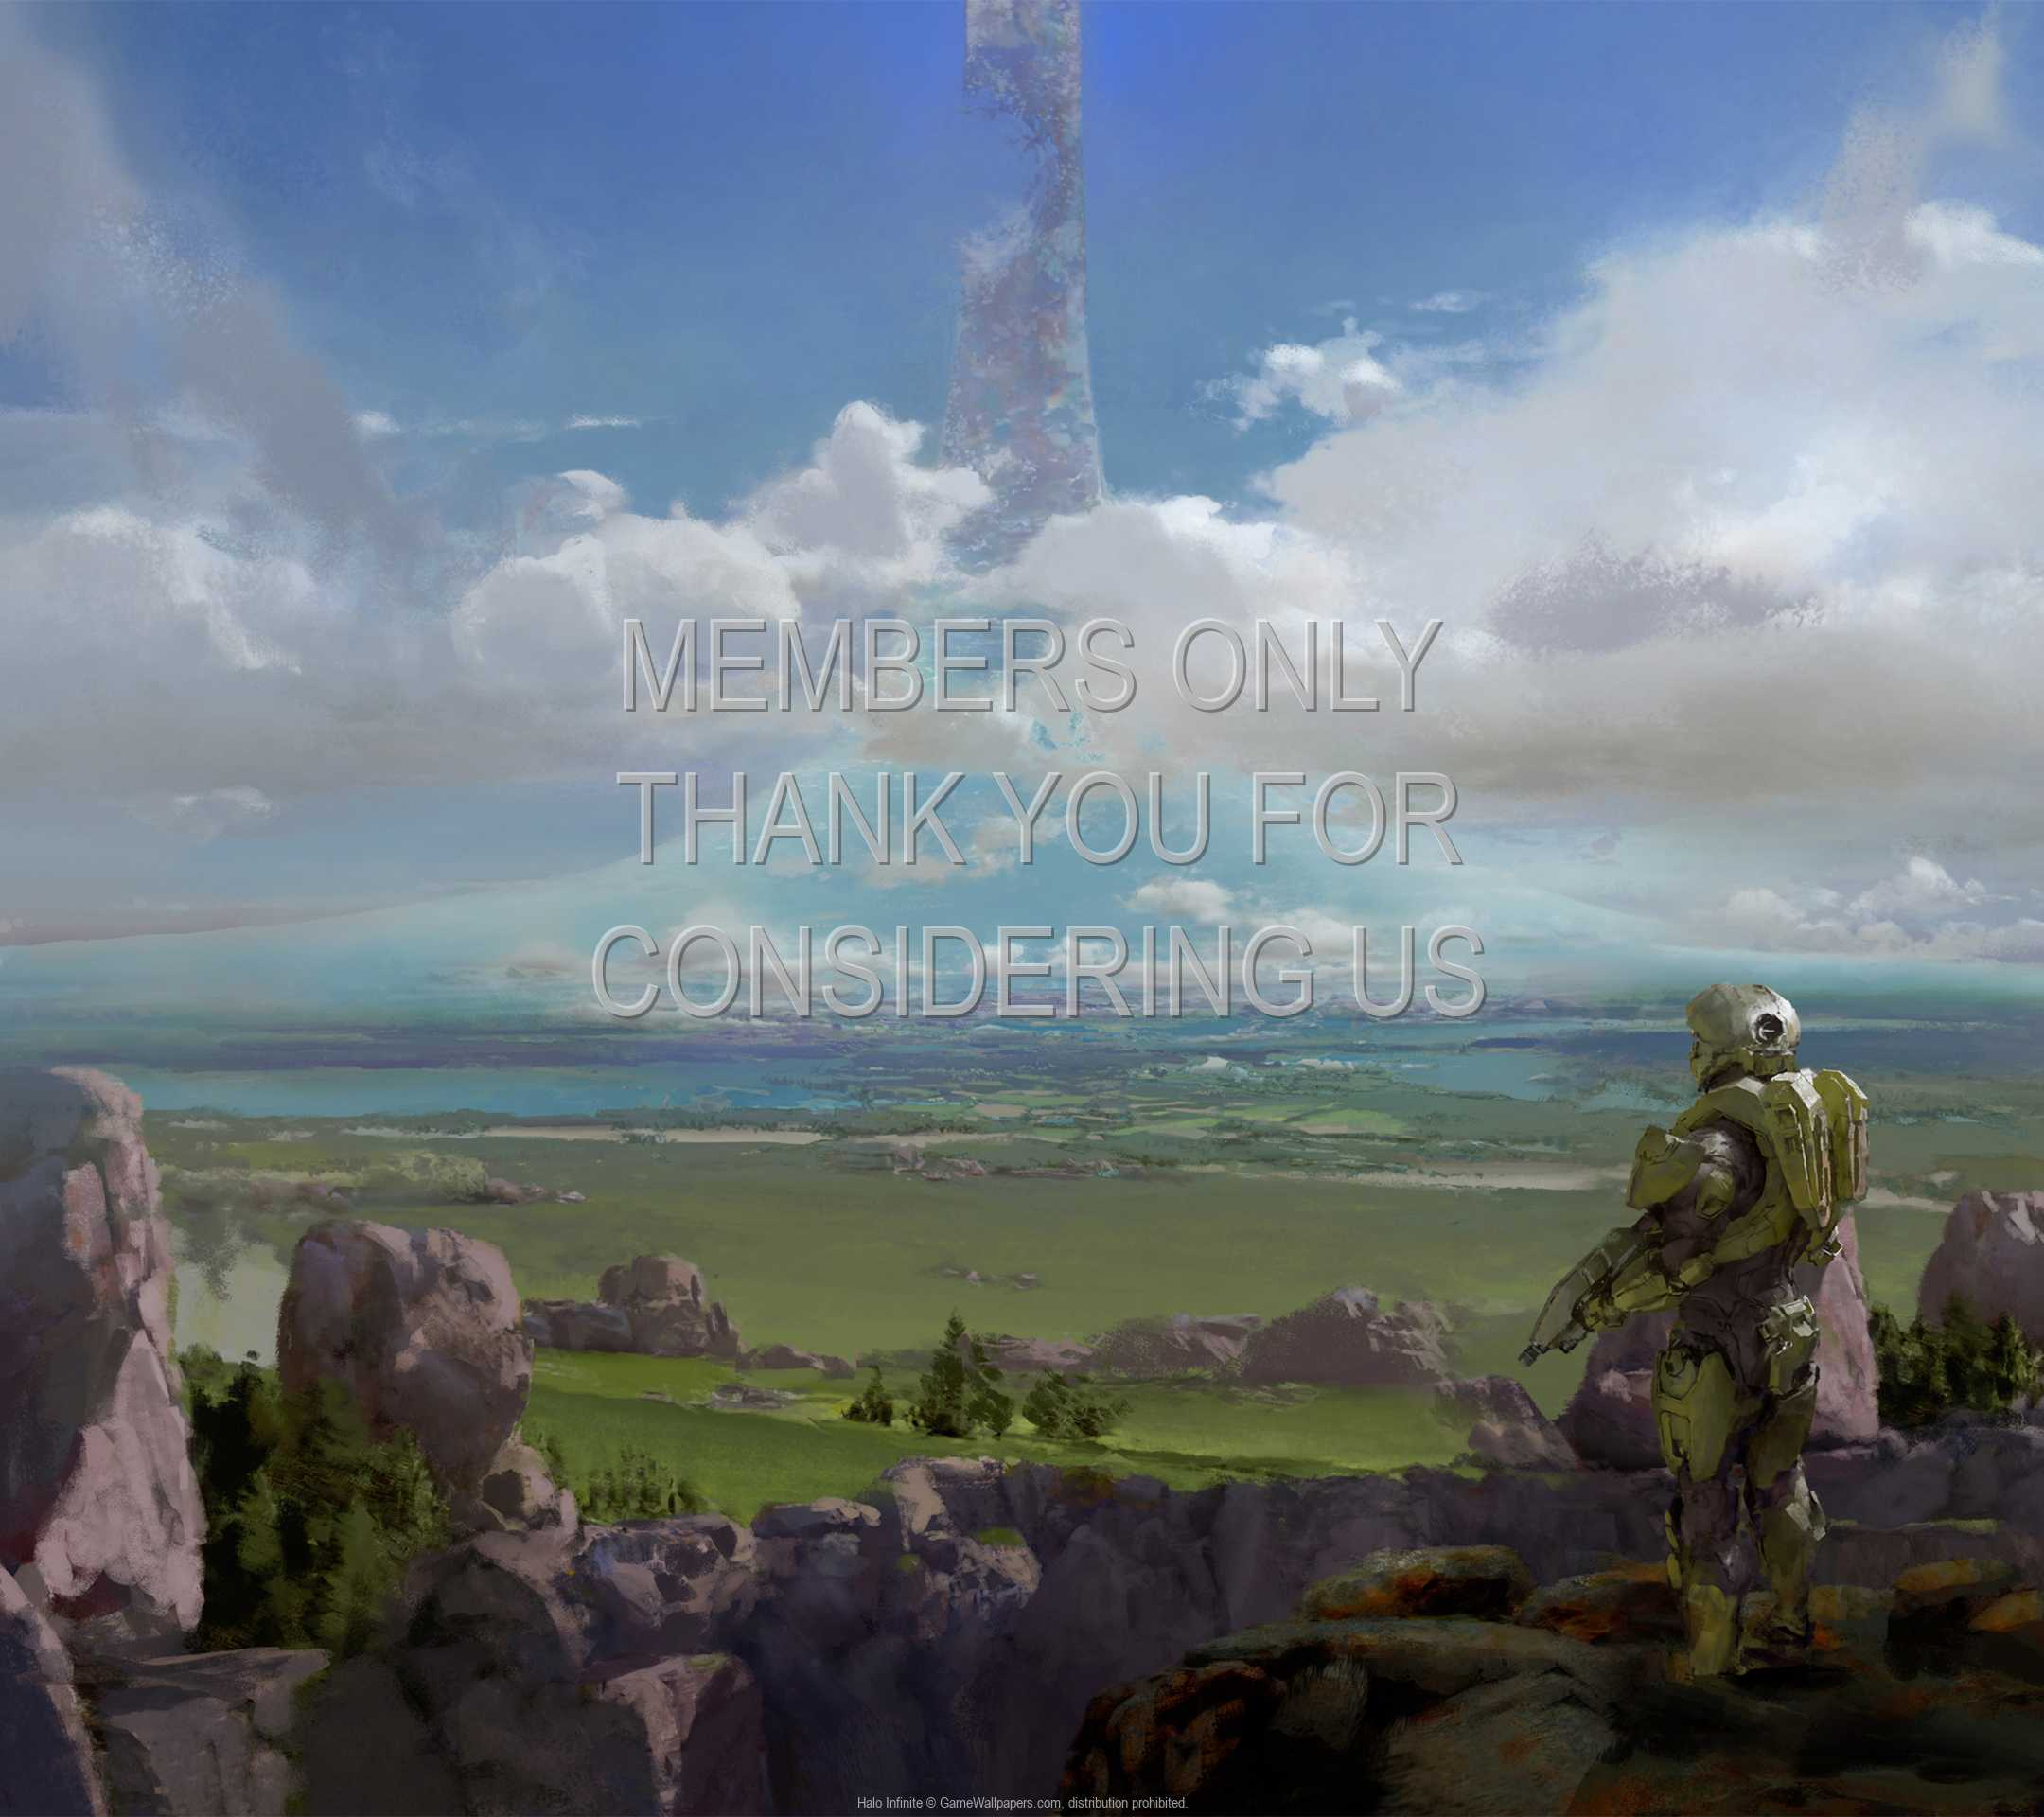 Halo: Infinite 1080p Horizontal Mobile wallpaper or background 15